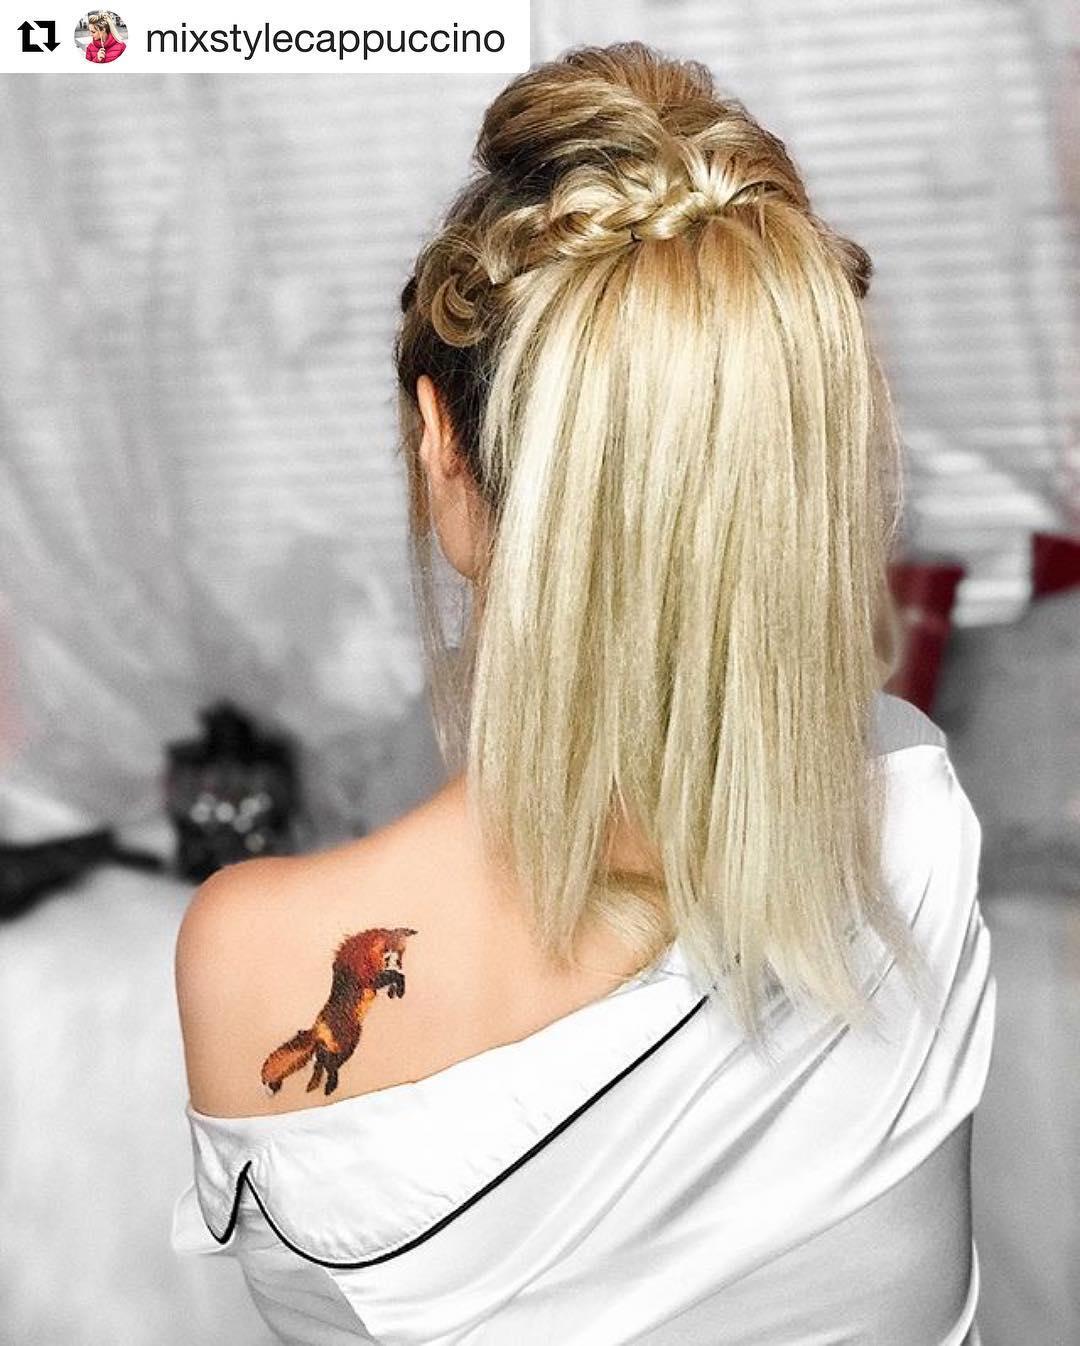 лисичка на плече